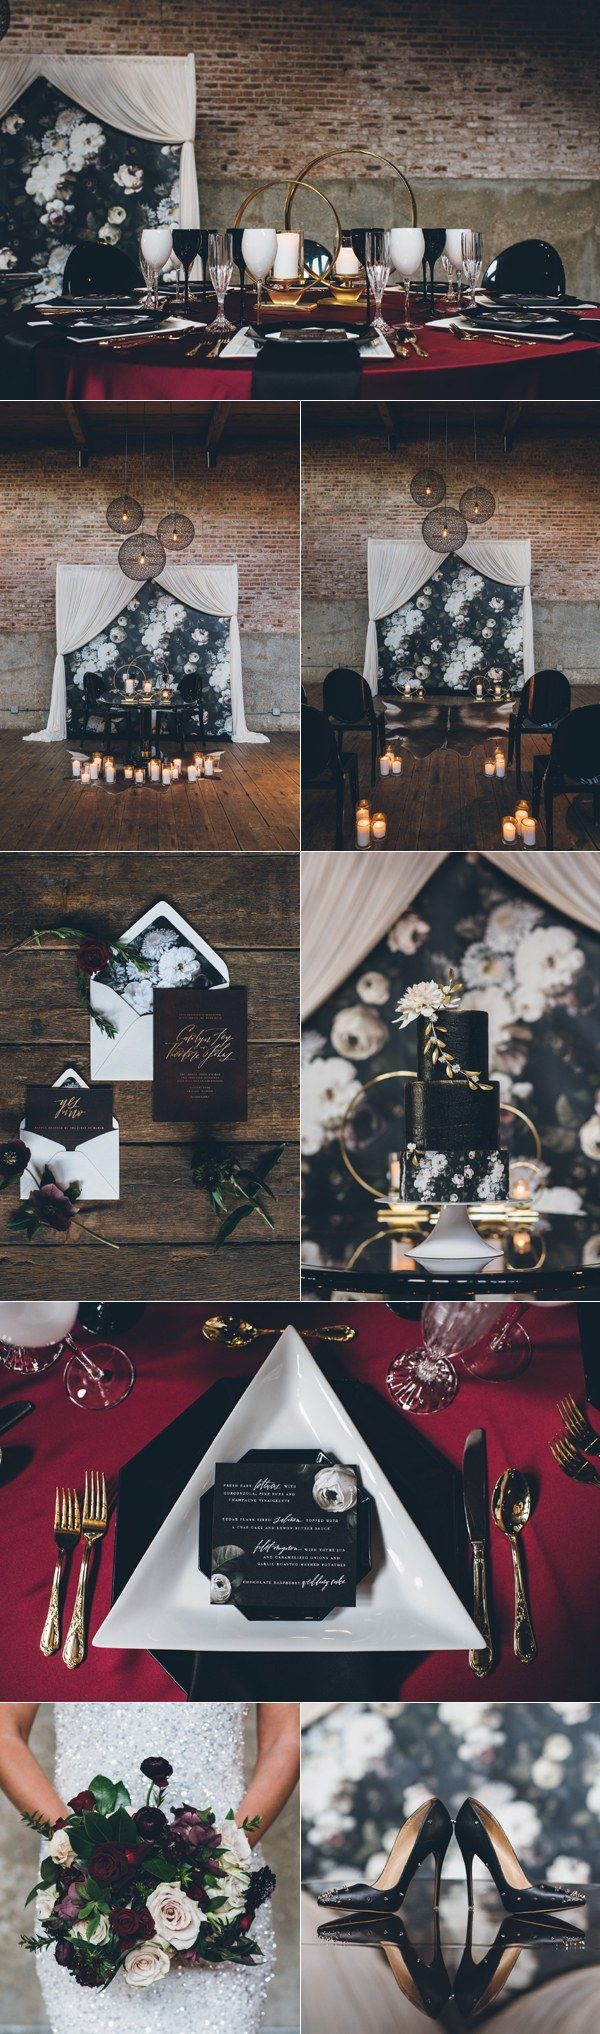 black white and gold industrial wedding ideas / http://www.deerpearlflowers.com/industrial-wedding-theme-ideas/2/